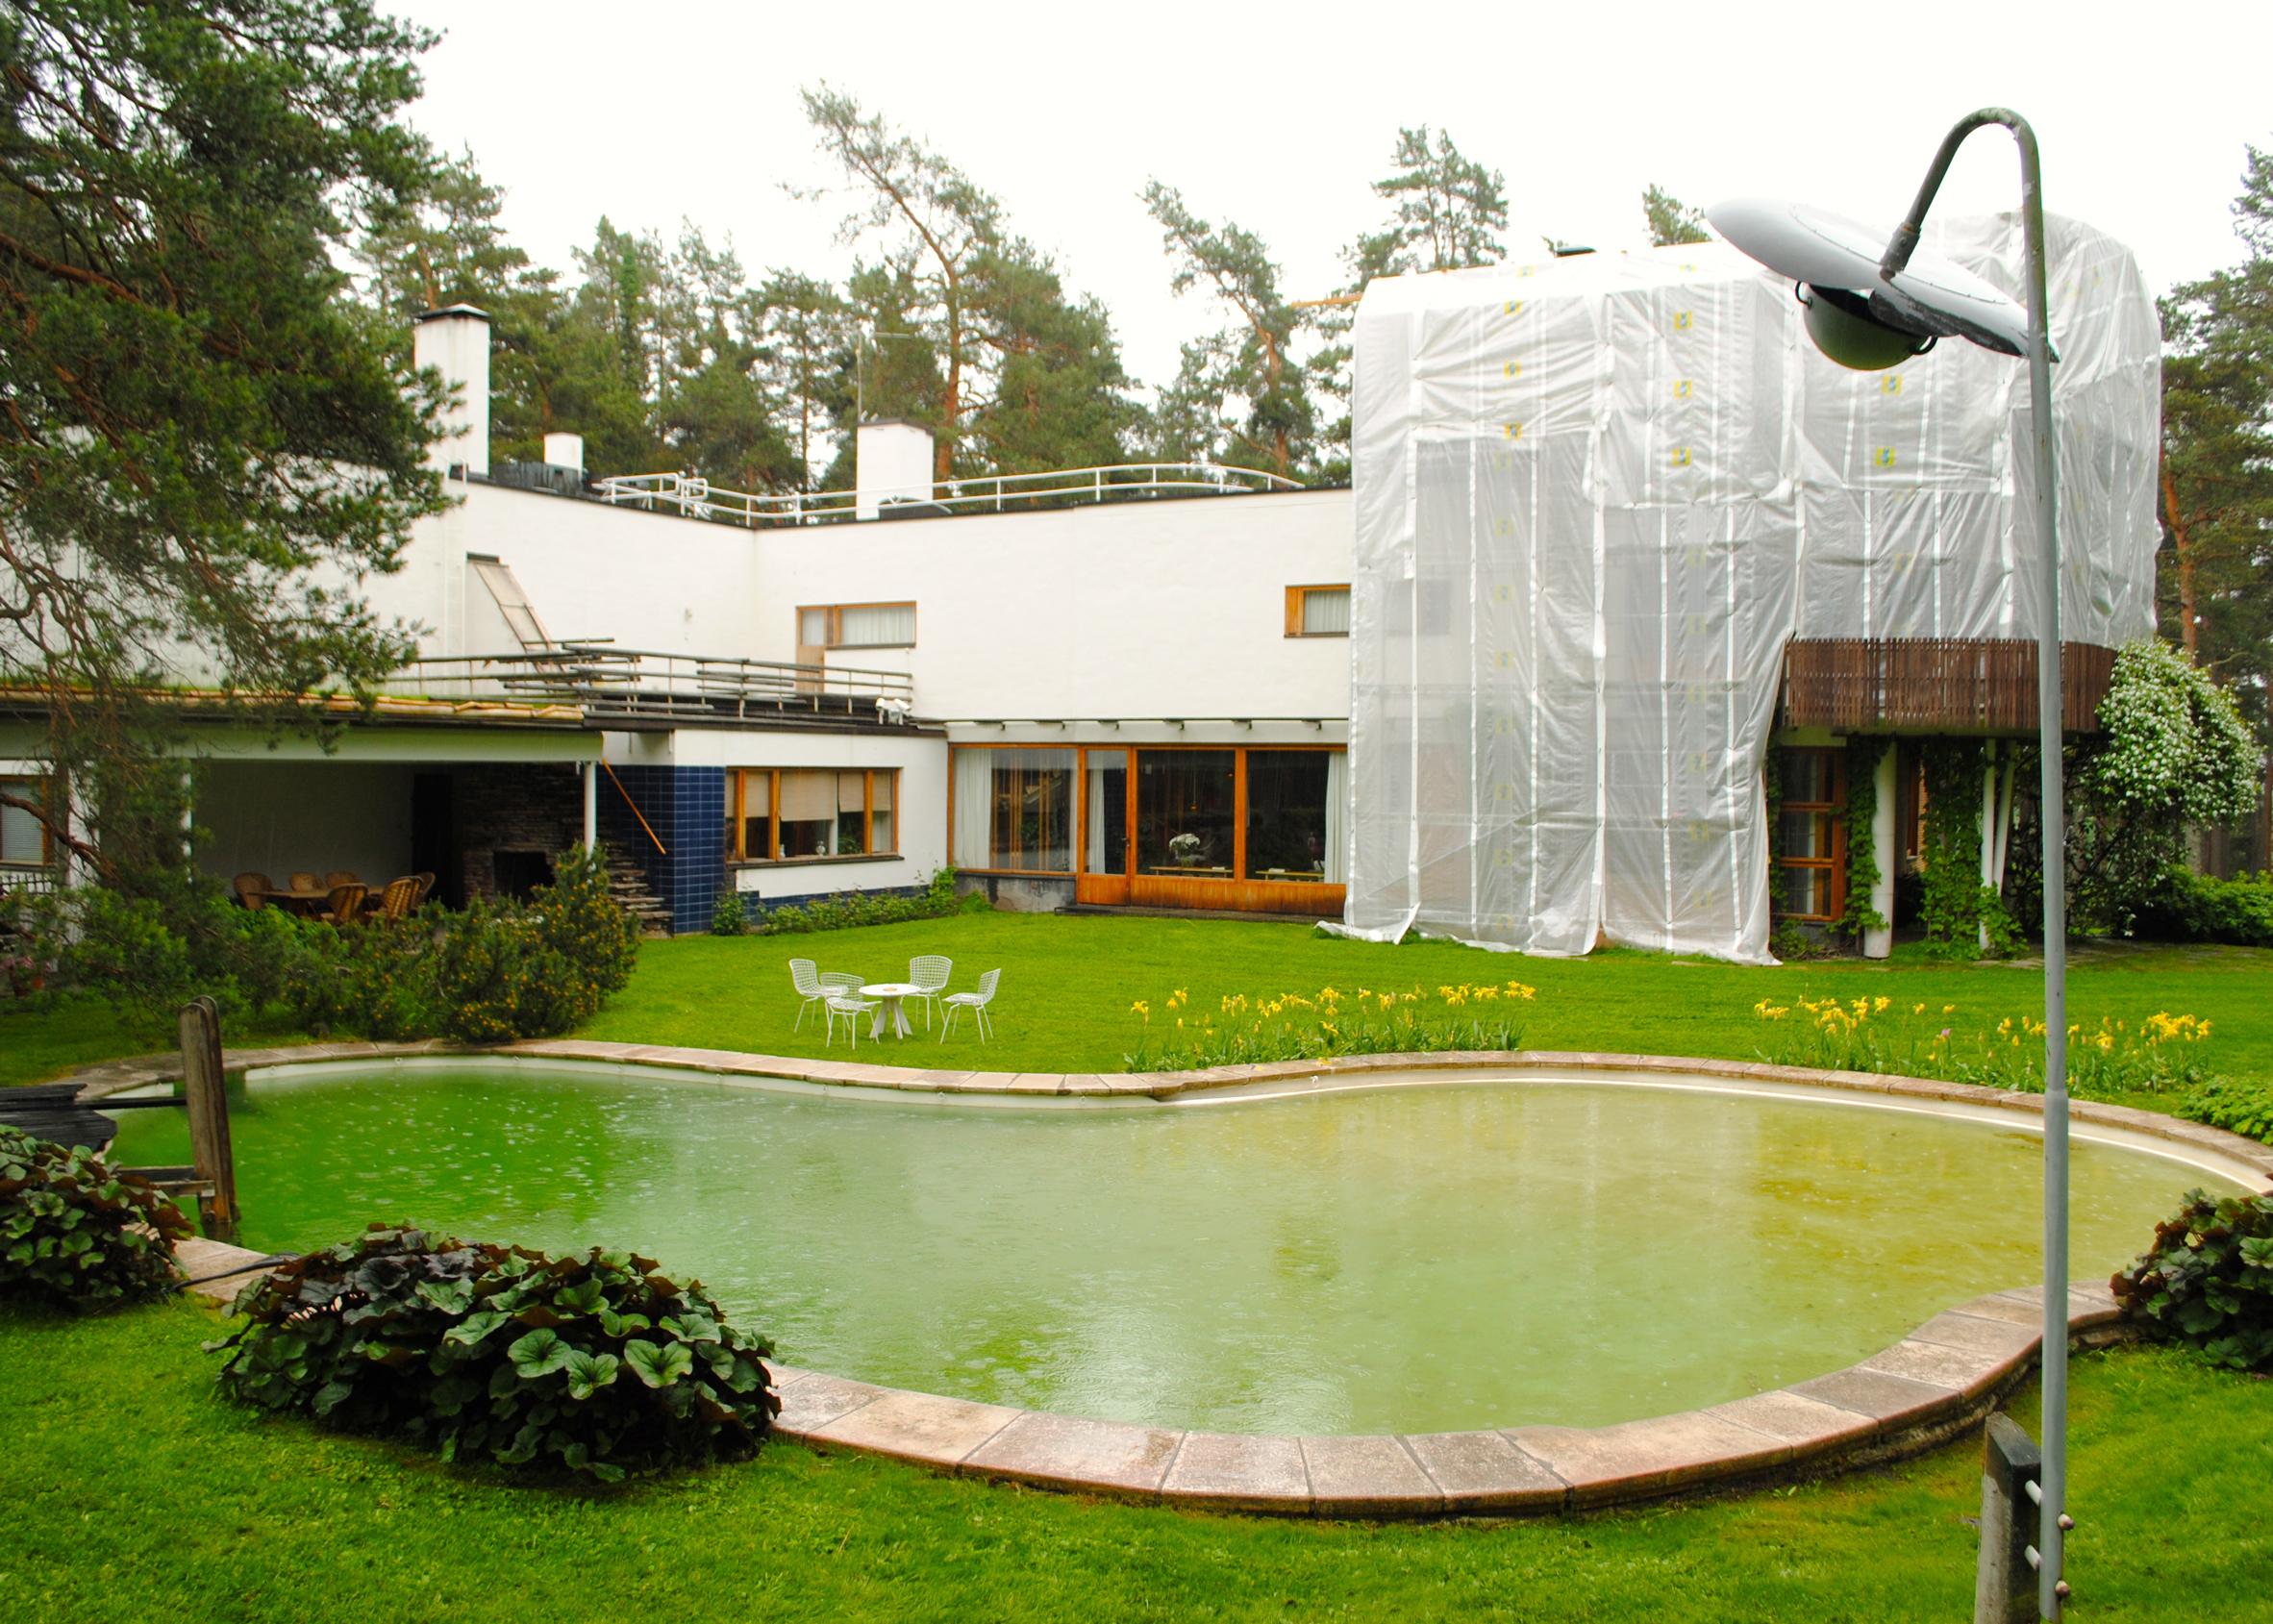 Alvar Aalto's pool at Villa Mairea